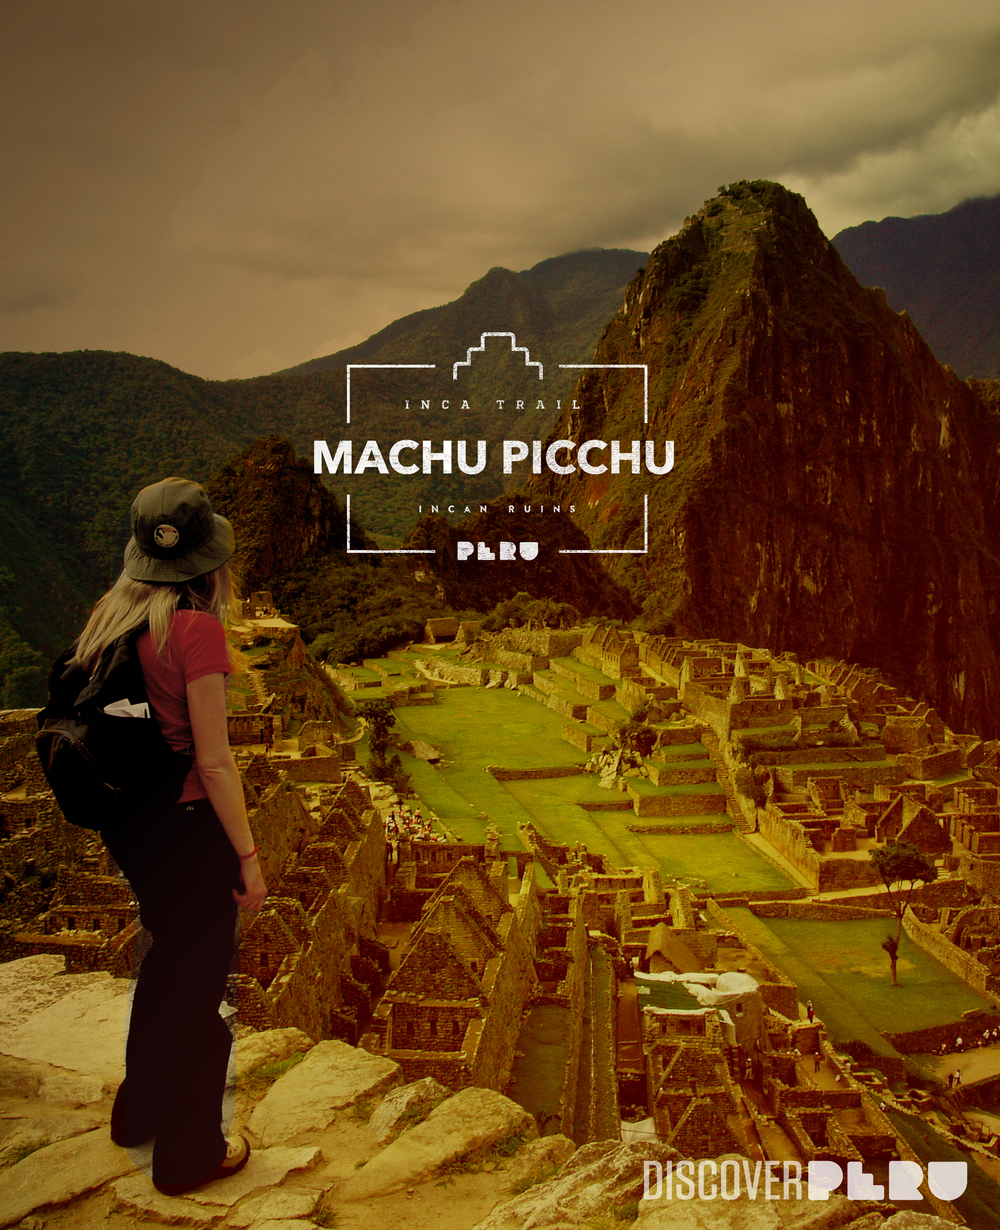 MachuPicchuMagazineAd.jpg